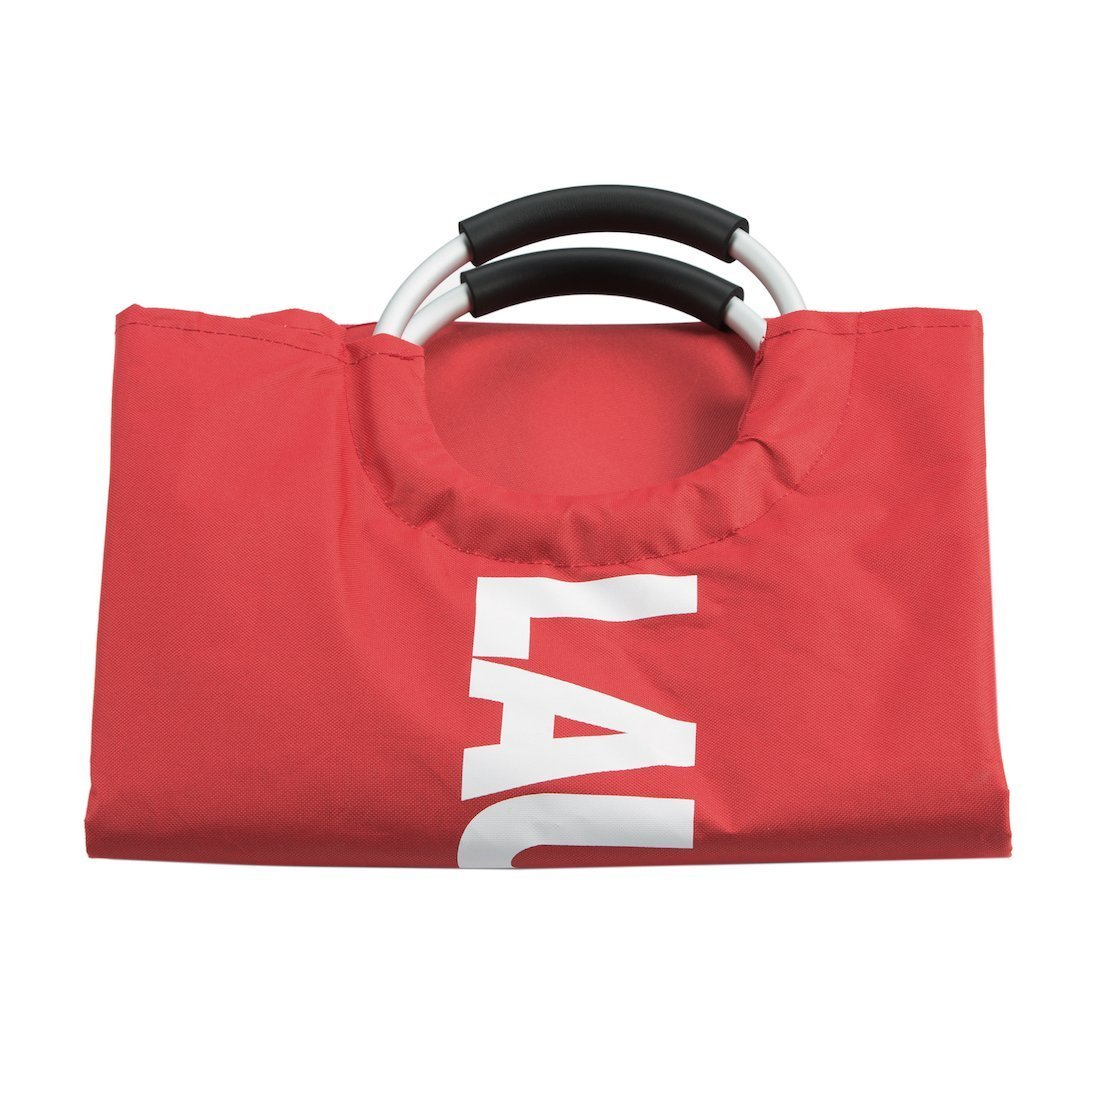 Dark Grey Collapsible Laundry Hamper Dorm Laundry Bag Peach Breeze Large Laundry Basket Foldable Clothes Bag